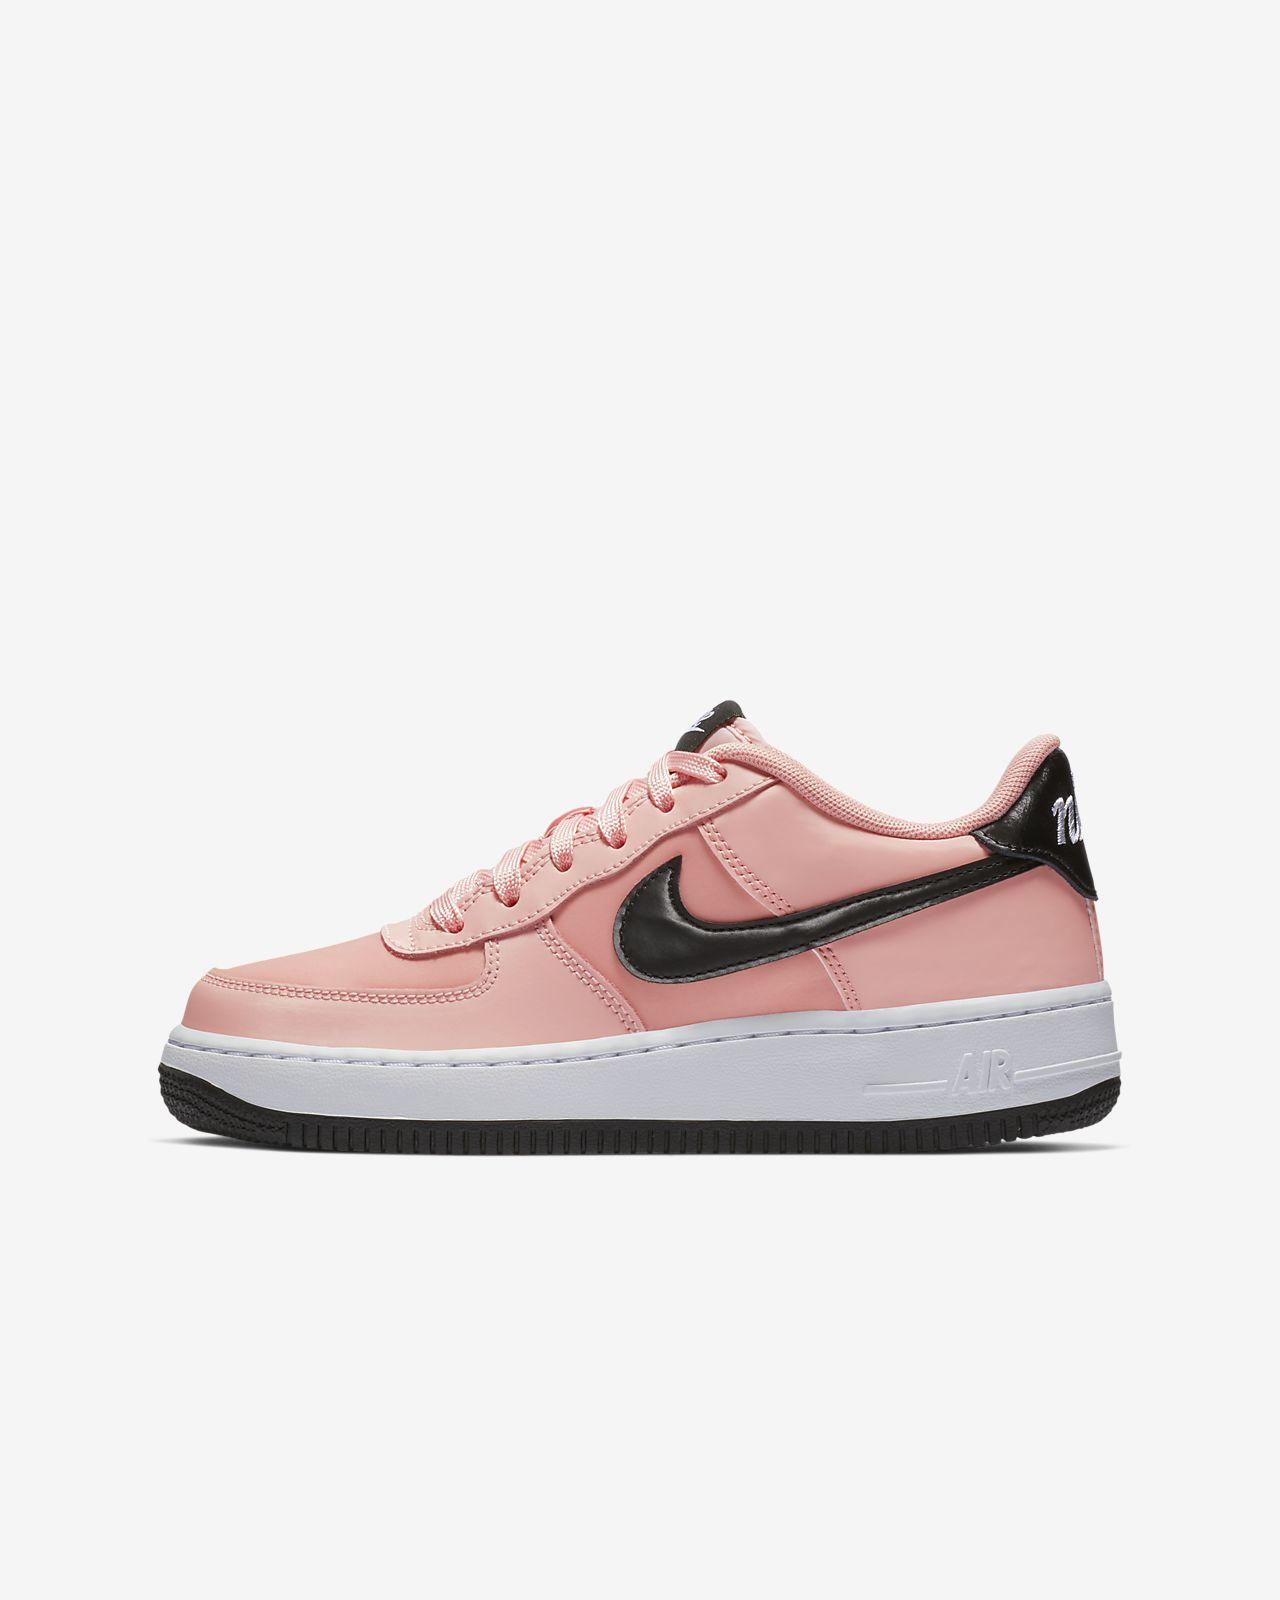 Nike Air Force 1 VDAY Older Kids' Shoe